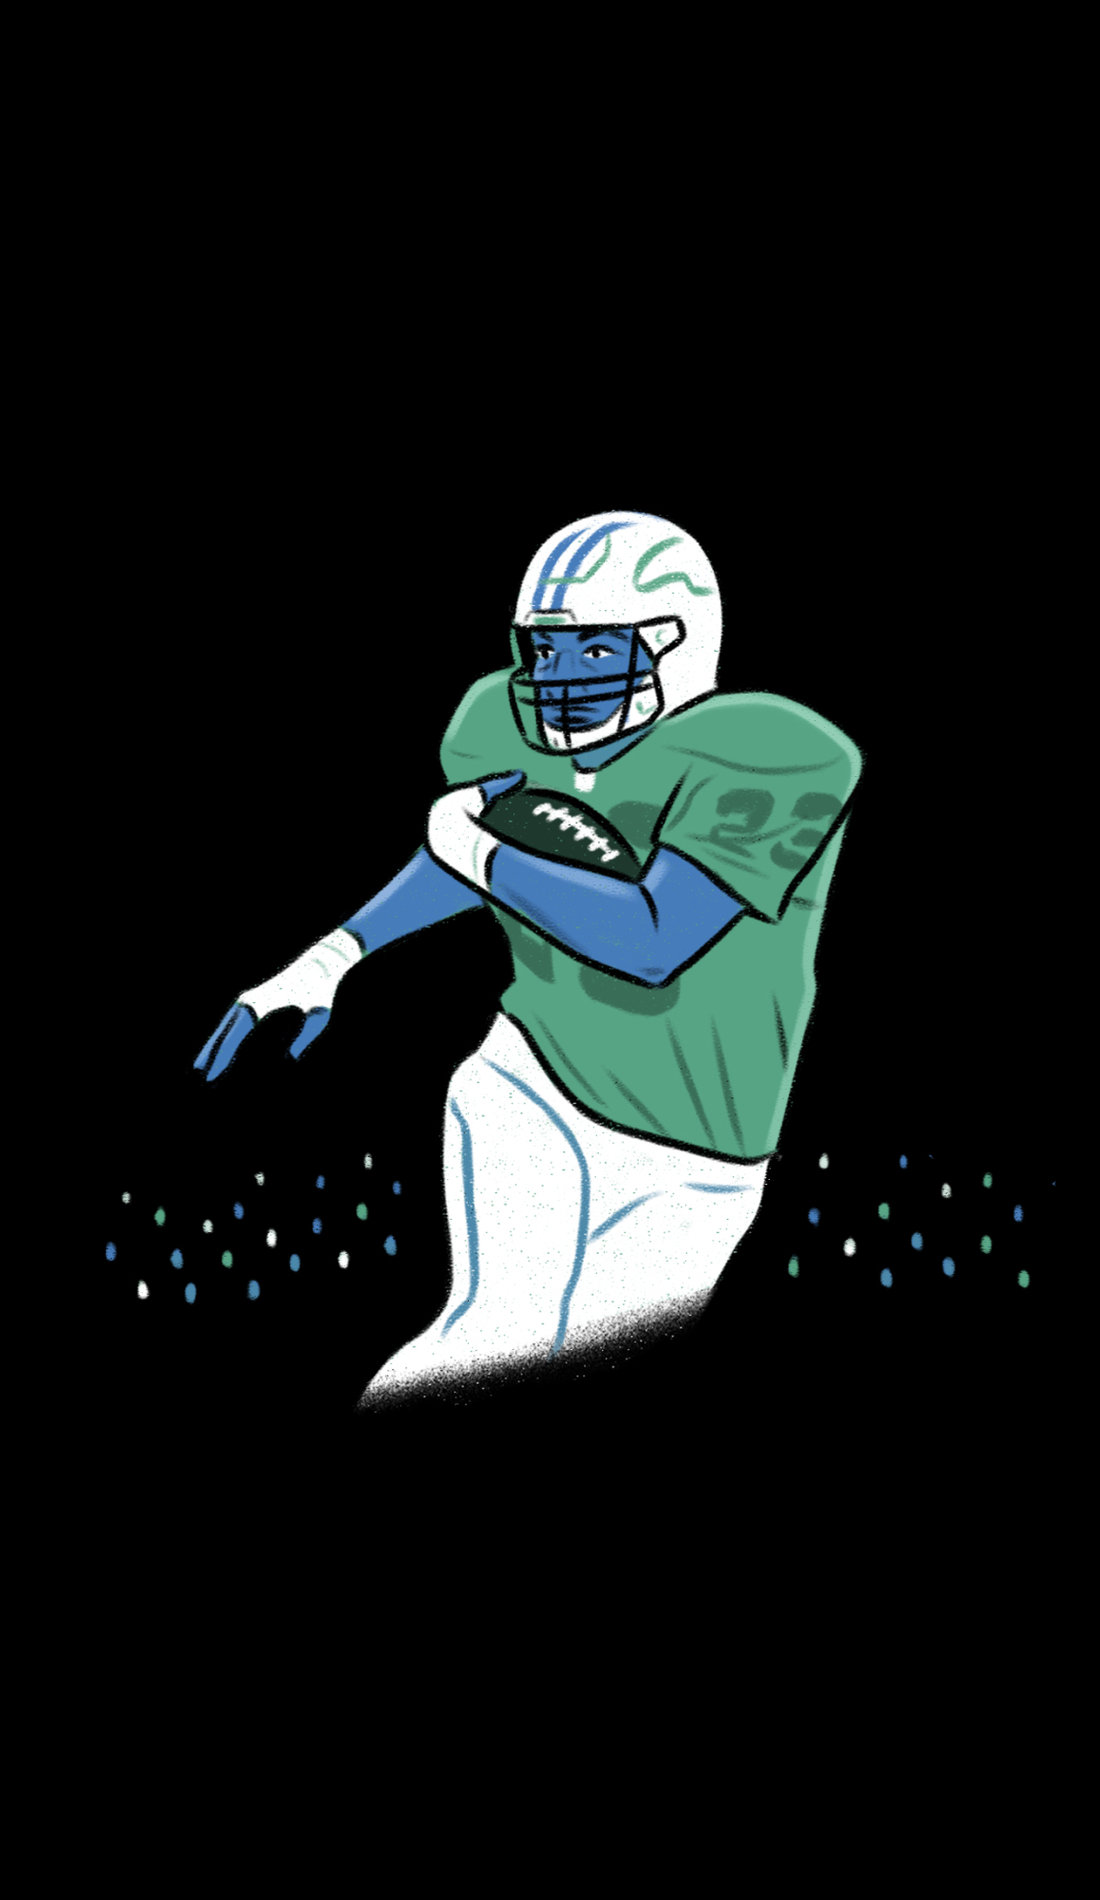 A Georgia Southern Eagles Football live event